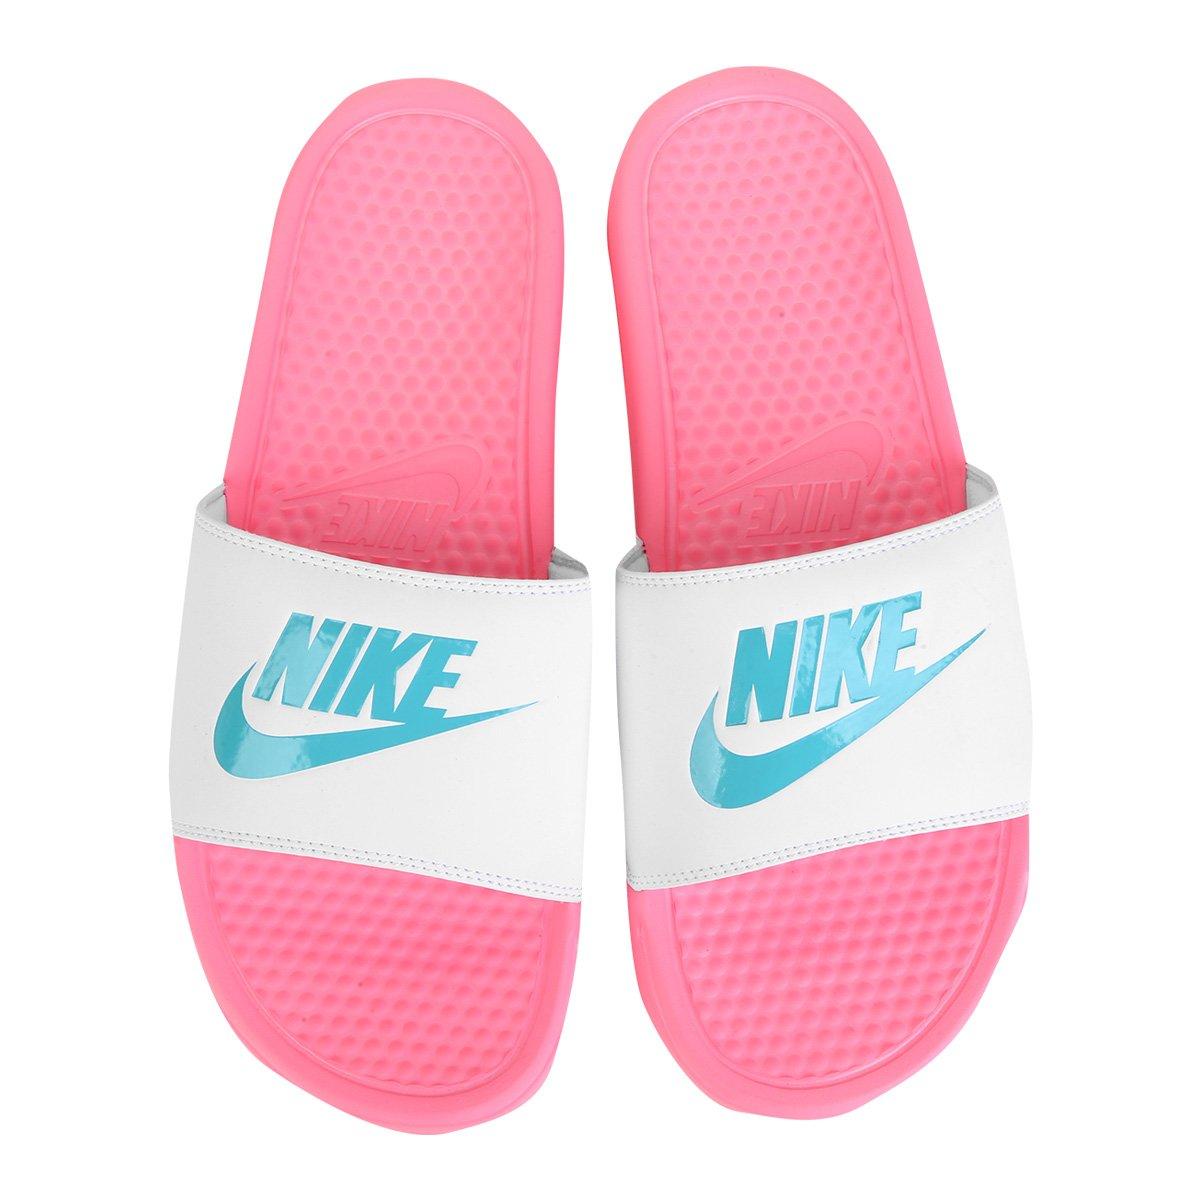 Chinelo Nike Benassi Jdi Slide Feminino Azul E Branco